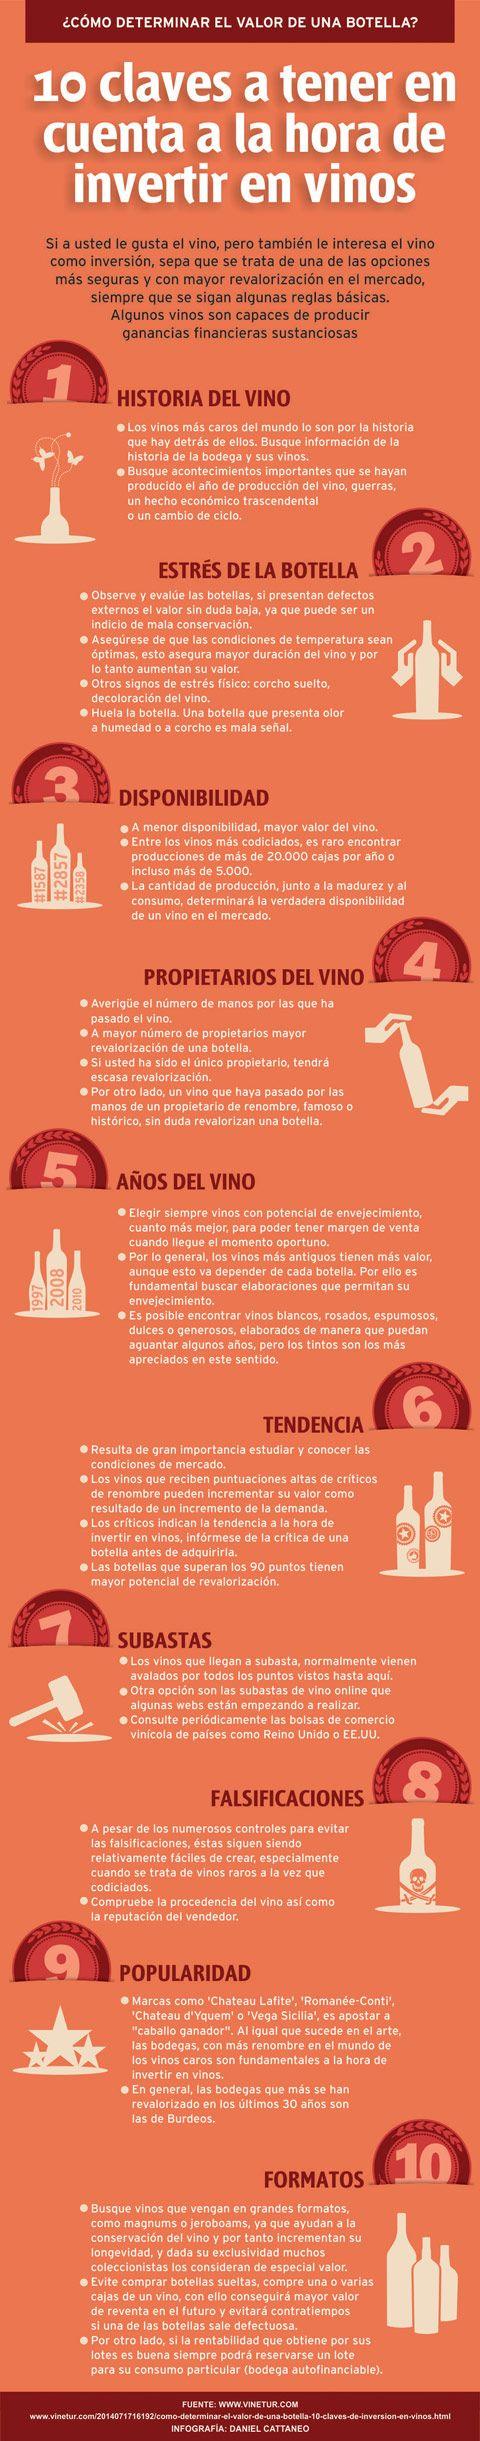 10 claves para invertir en vinos #infografia #infographic